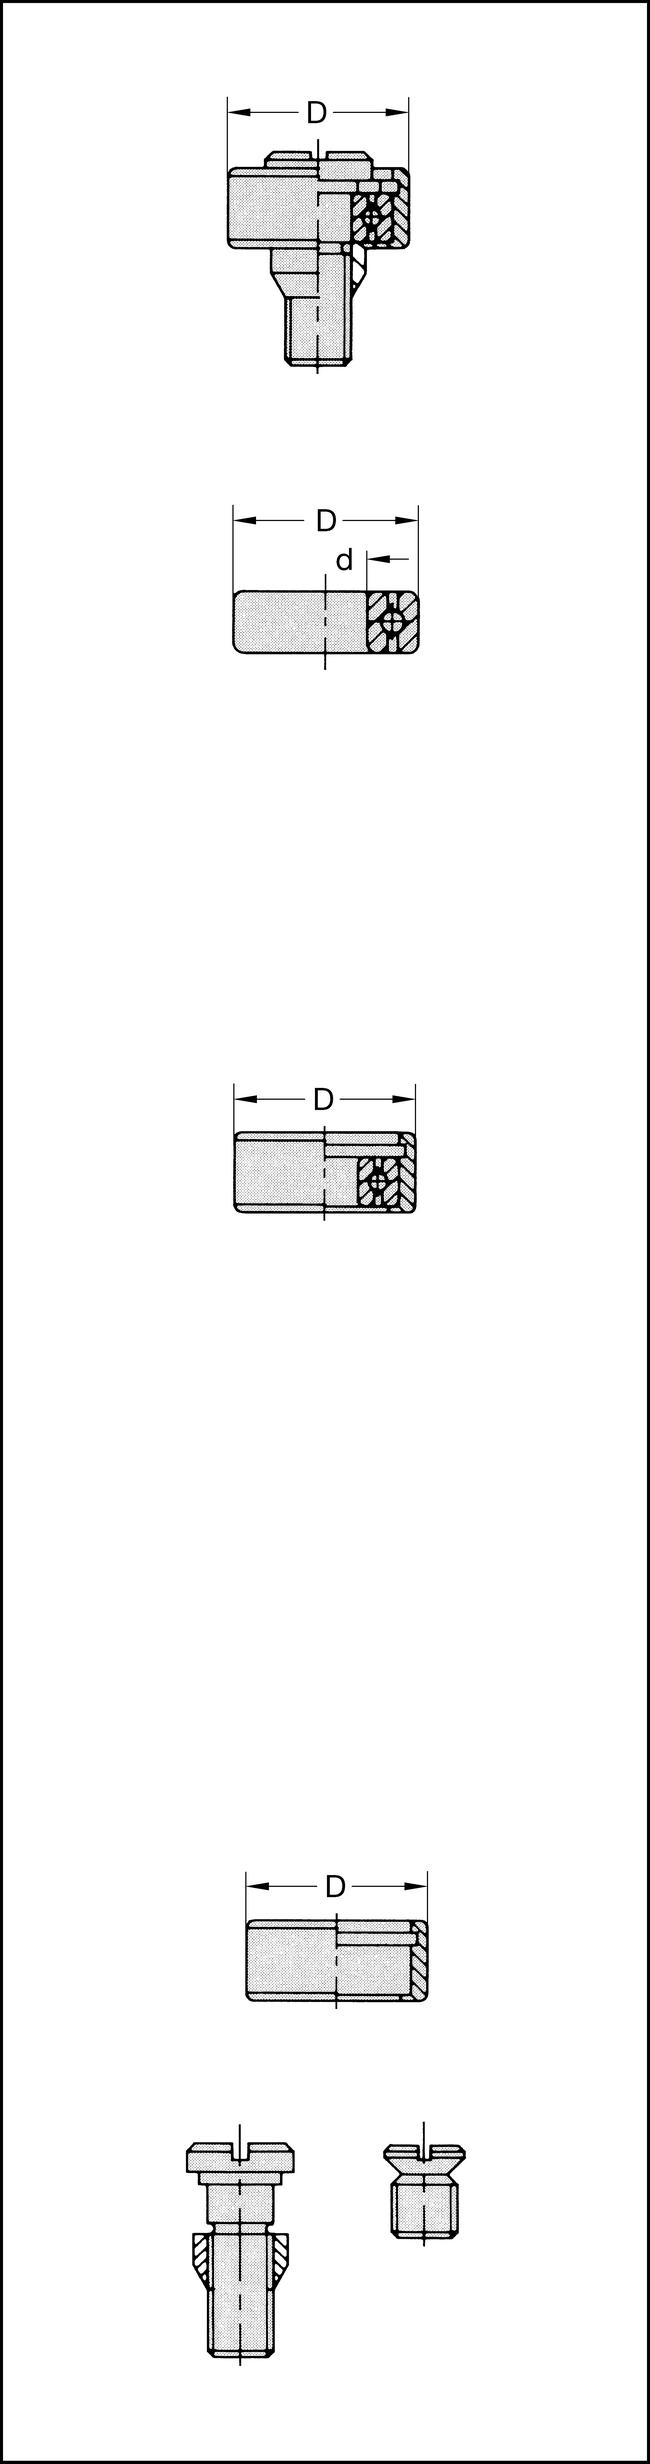 Kugellager 16x5mm,d=8mm